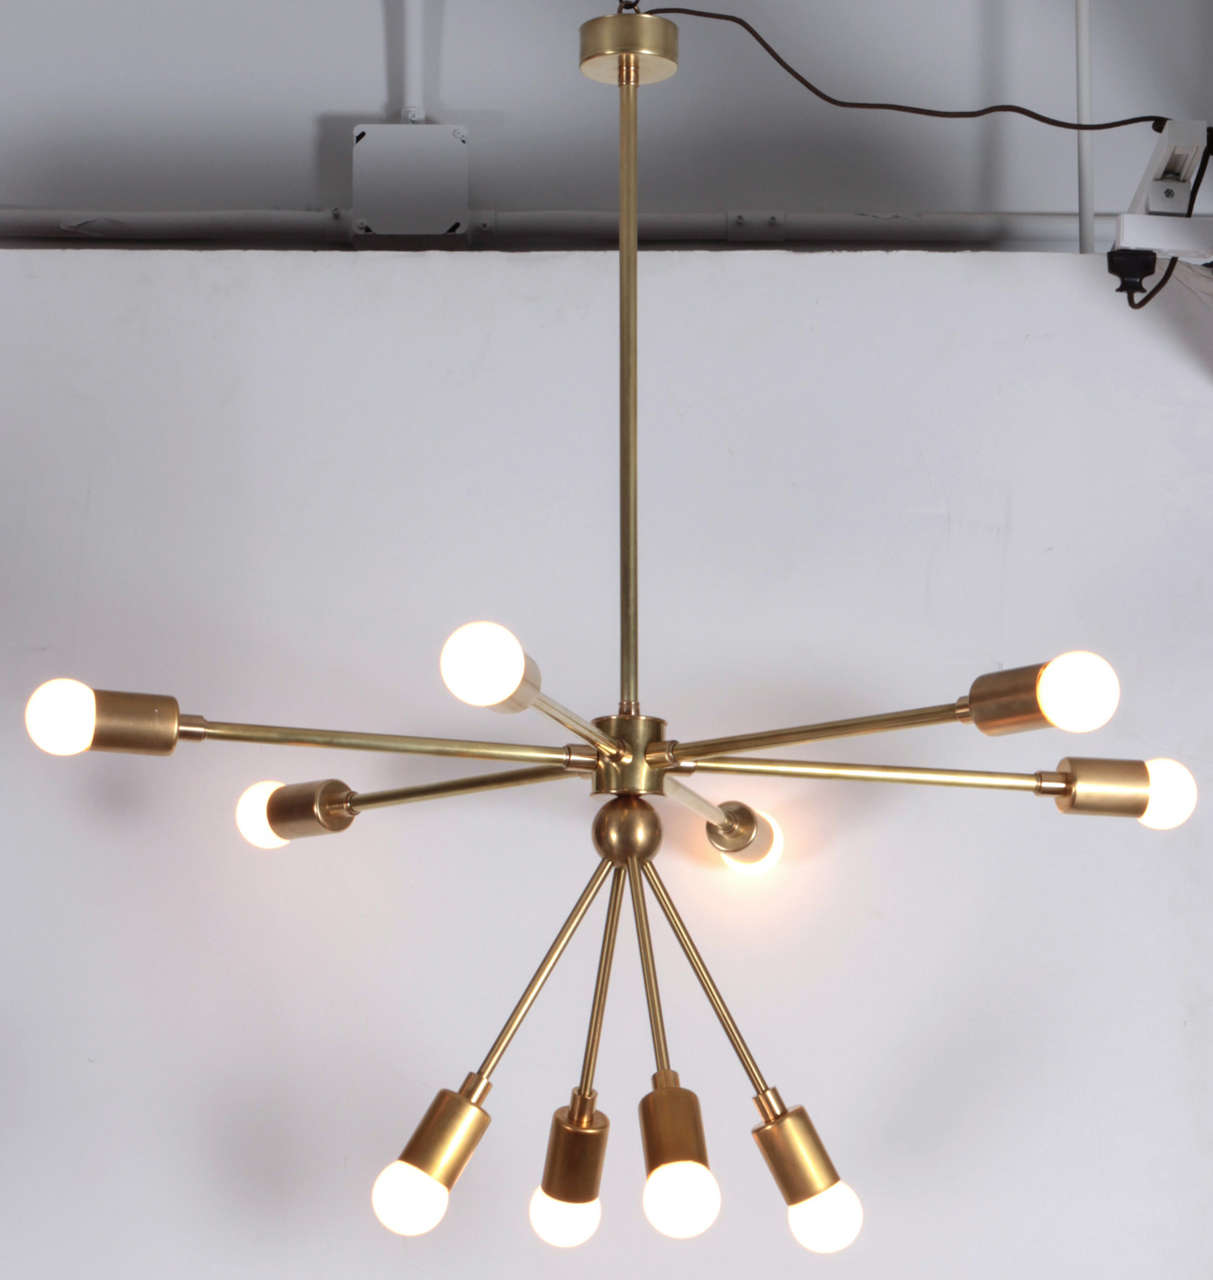 Contemporary Custom Macomber Modern Brass Sputnik Light Fixture For Sale